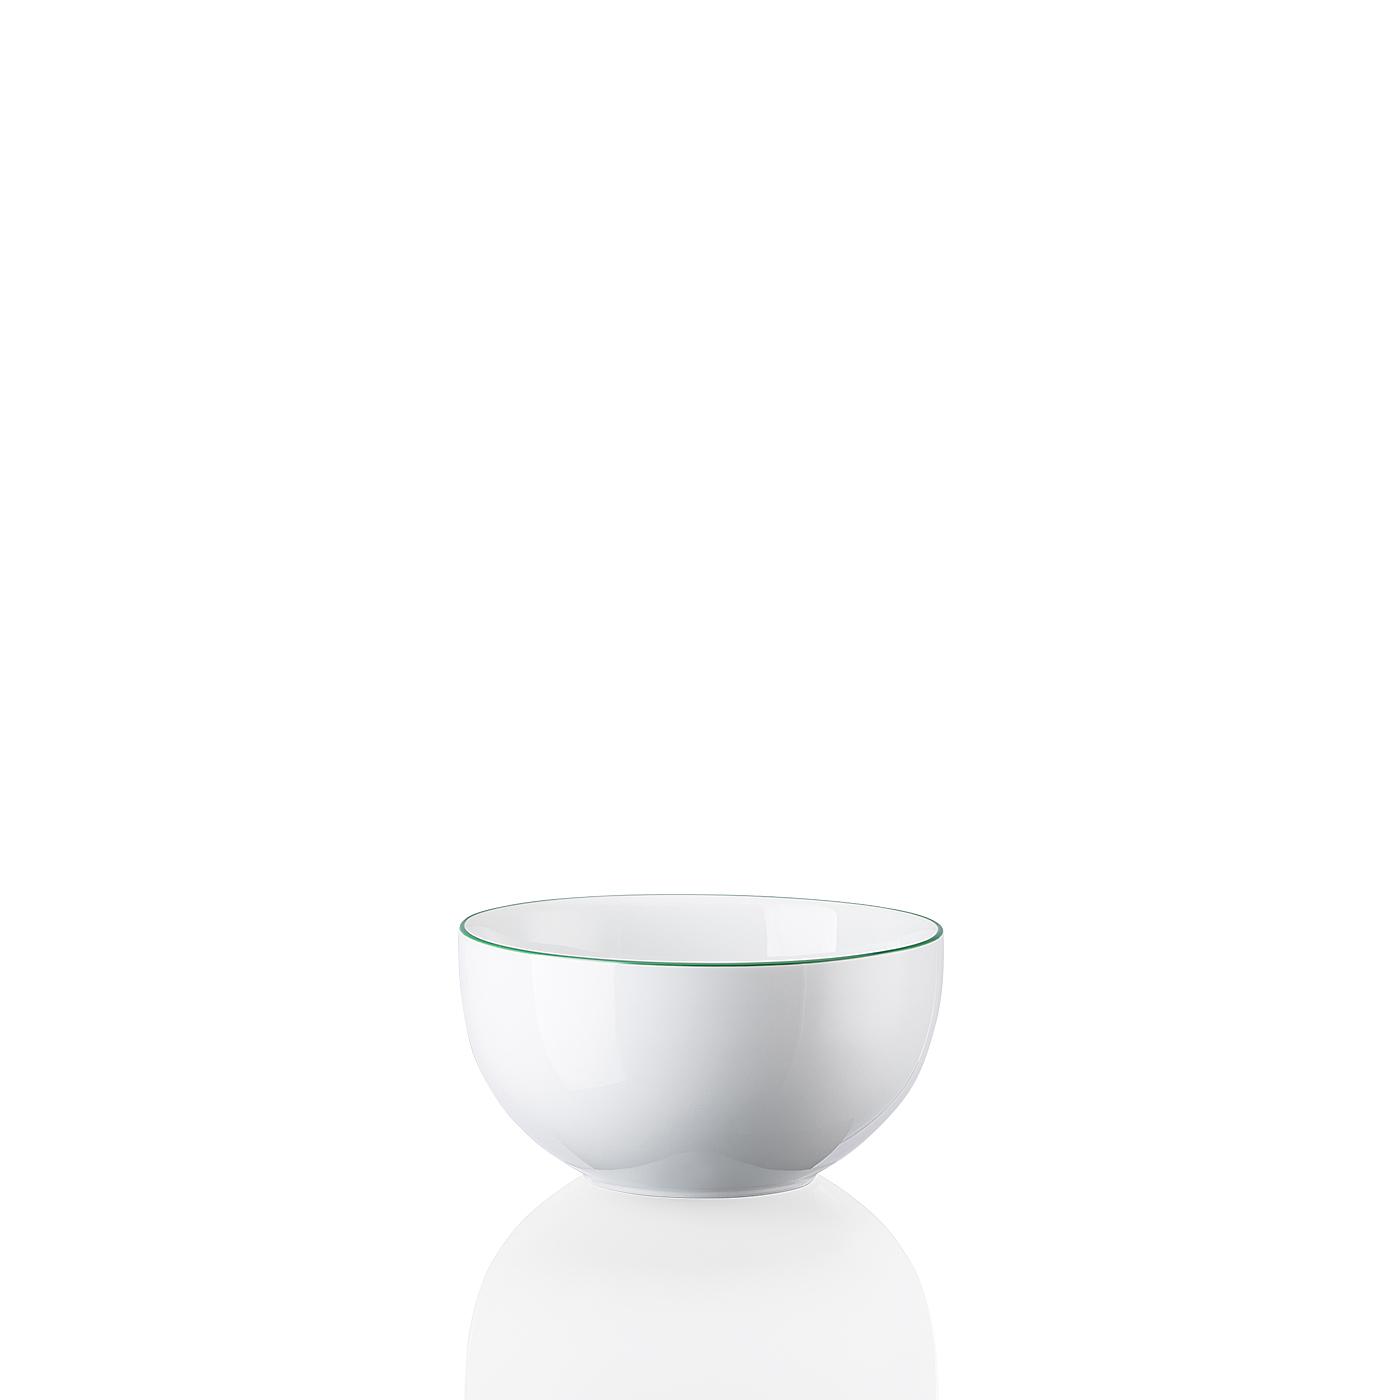 Schüssel 13 cm Cucina-Basic Colori Green Arzberg